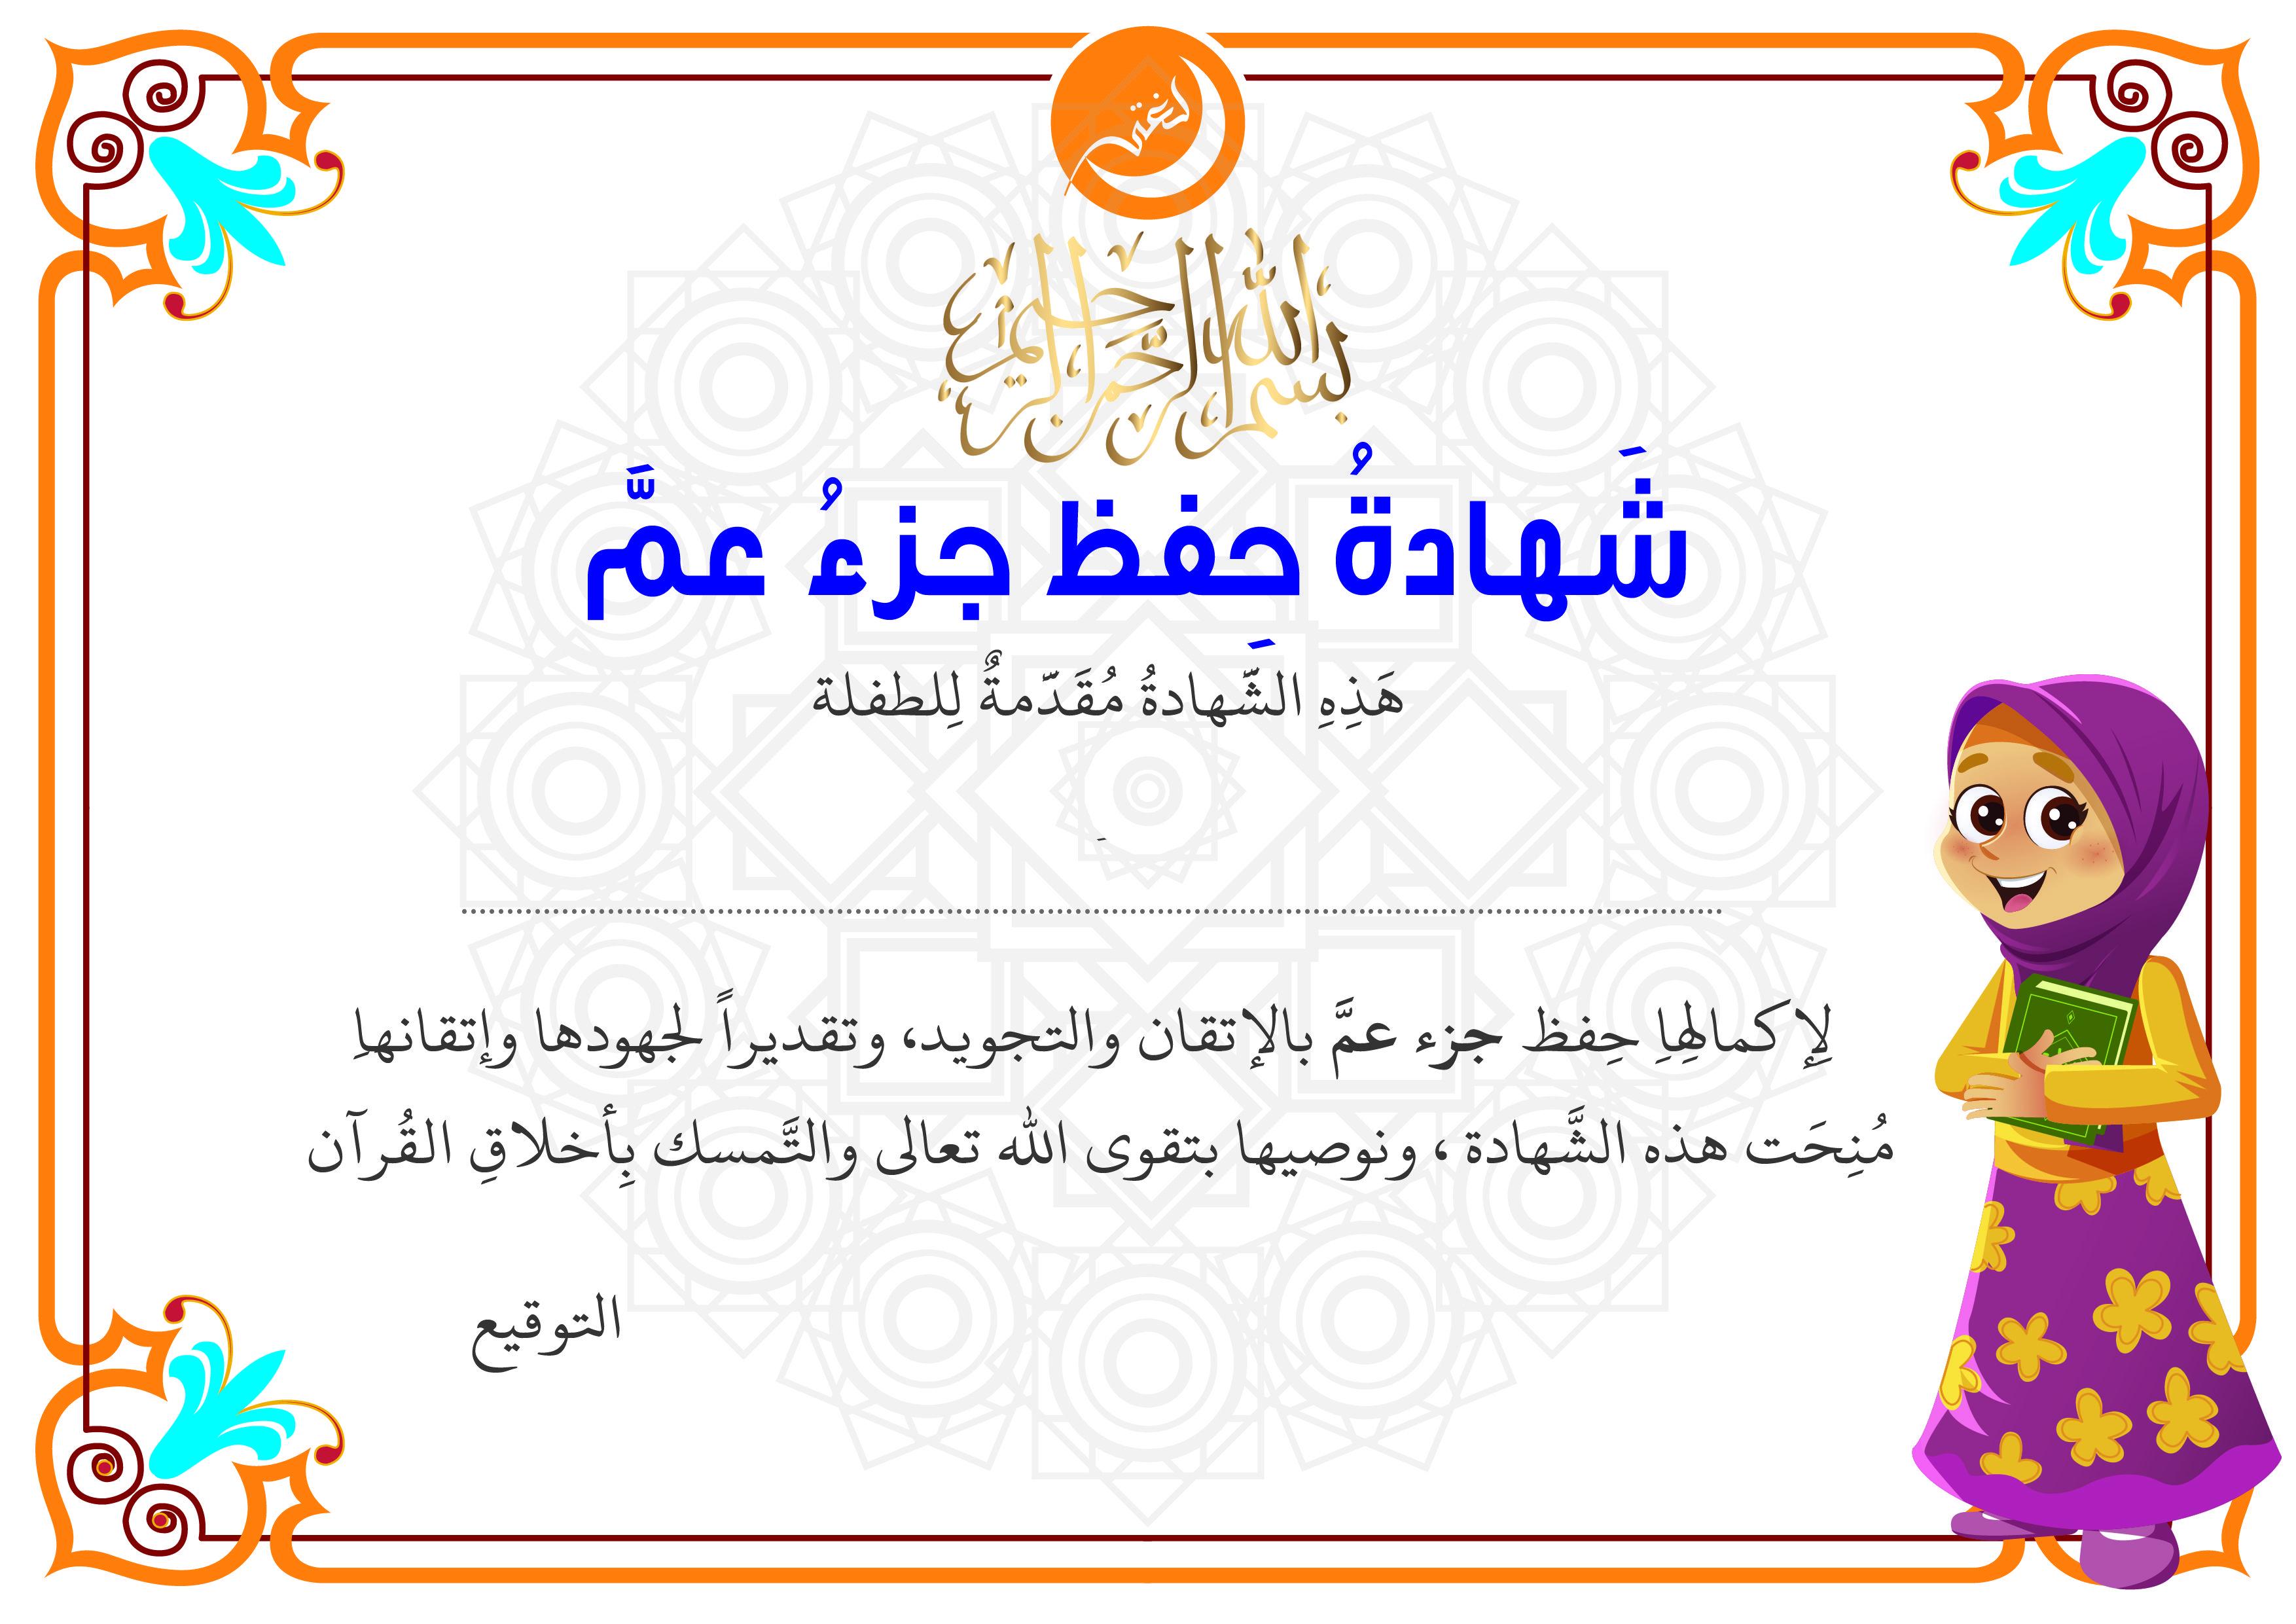 شهادة حفظ جزء عم للفتيات Islamic Kids Activities How To Memorize Things Muslim Kids Activities